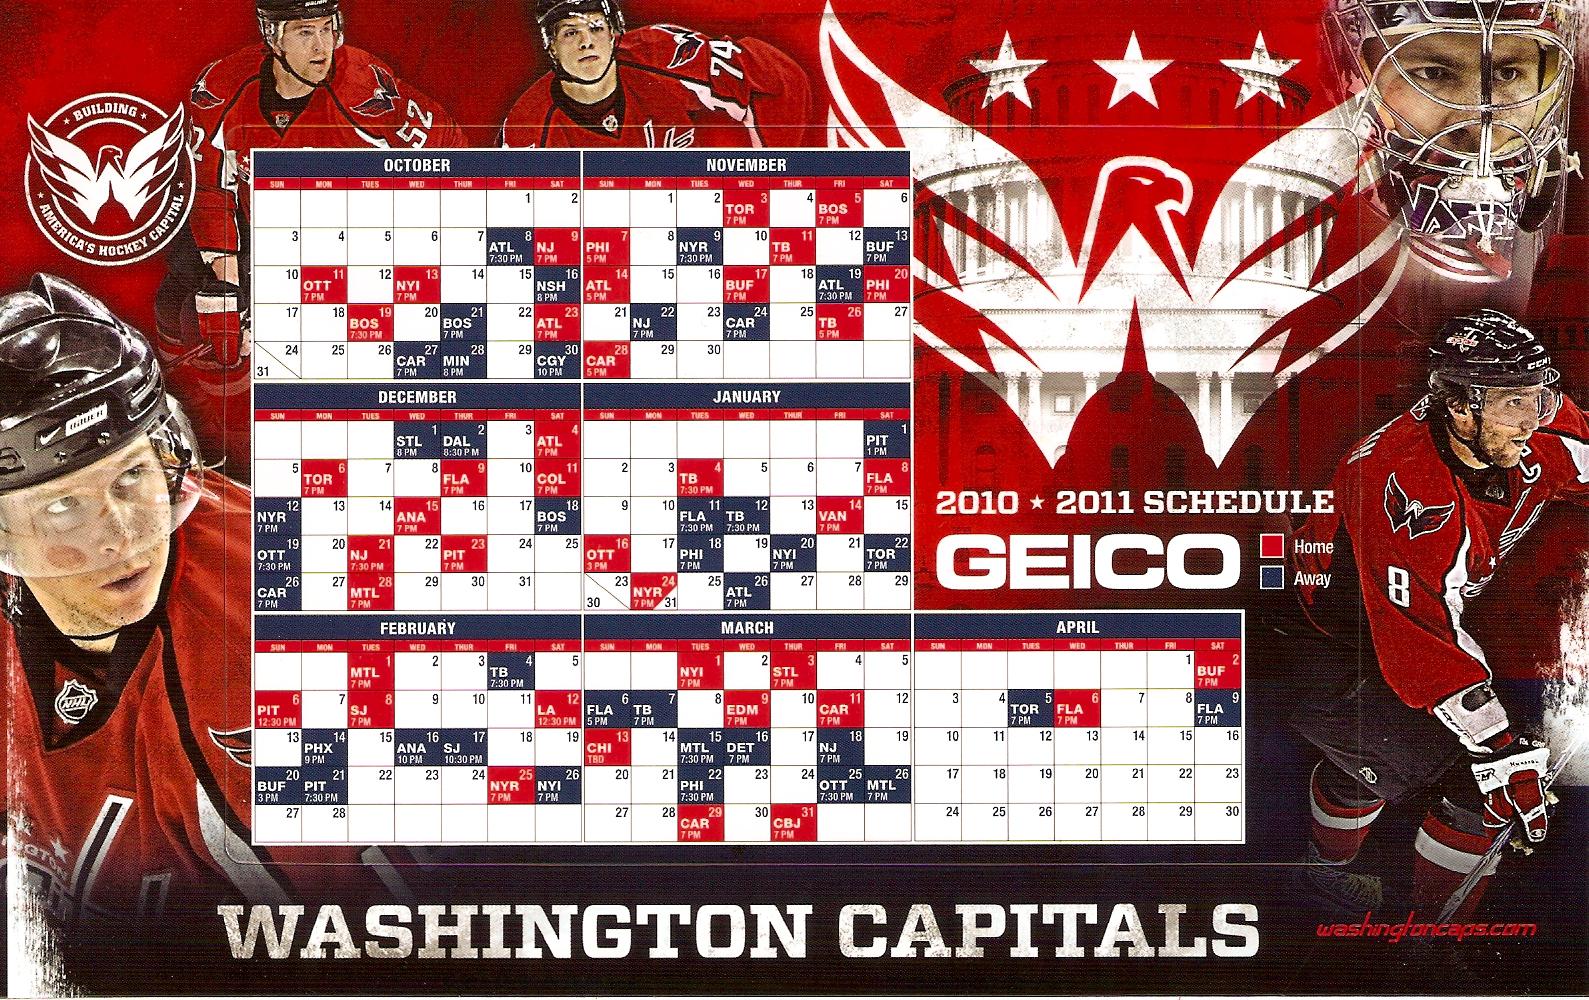 2010-11 Caps Schedule Magnet - Capitals Outsider 26cb763ea8d